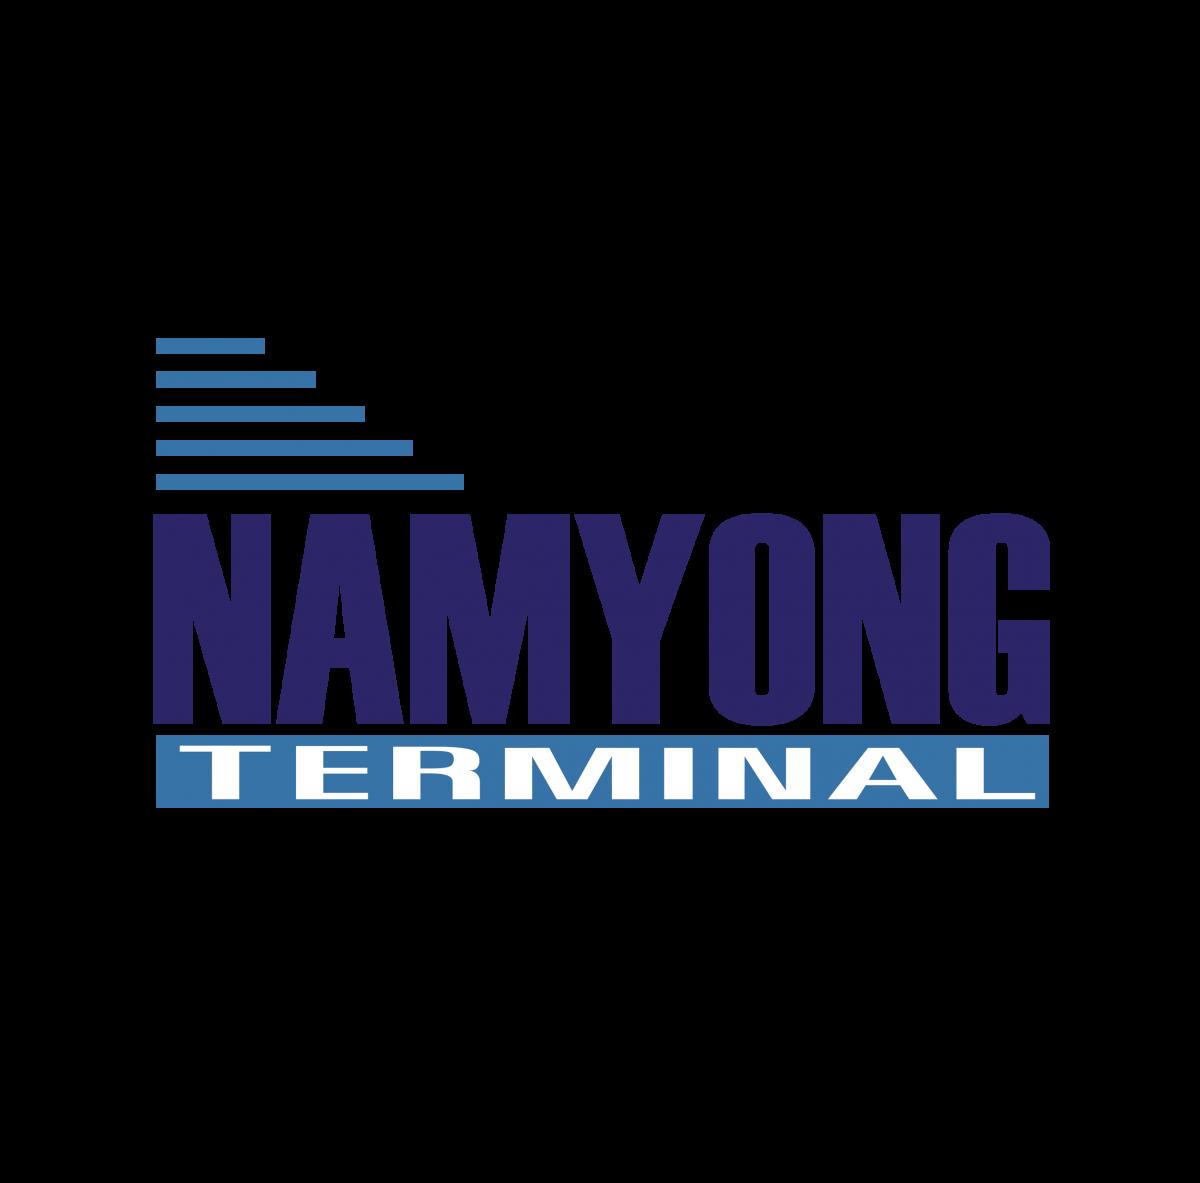 Namyong-Terminal-Public-1200x1183.png